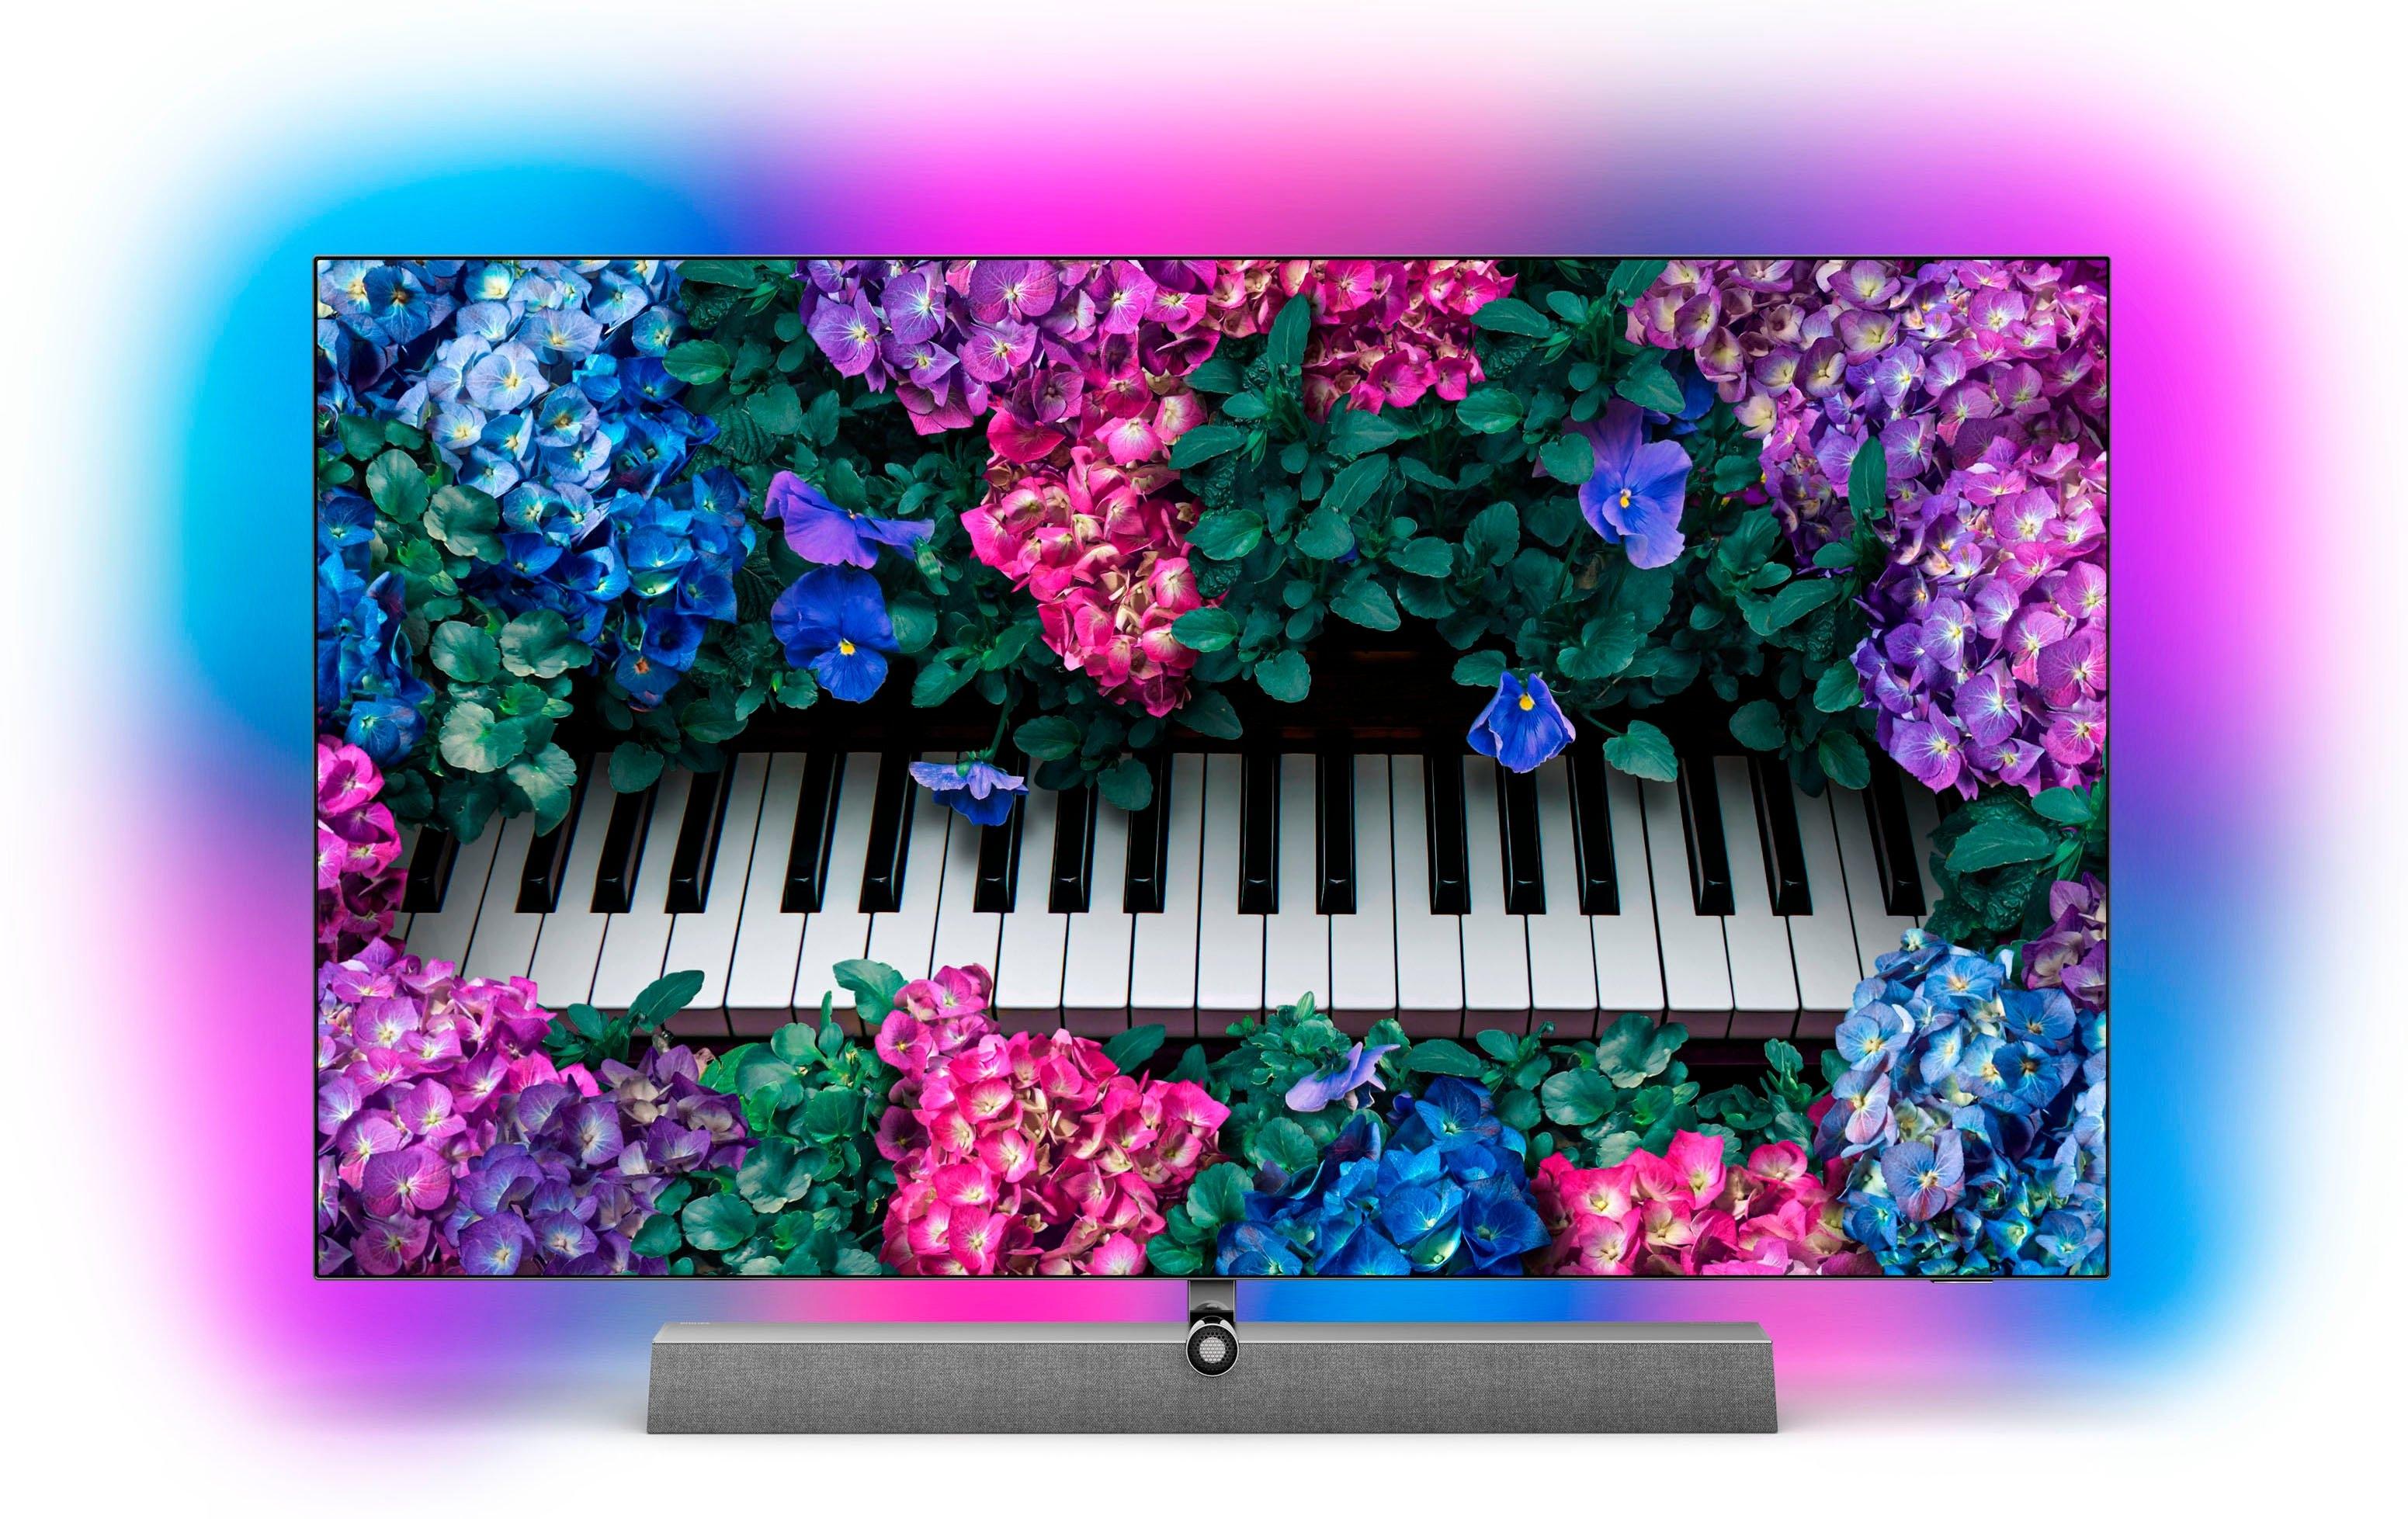 Philips OLED-TV 48OLED935/12, 121 cm / 48